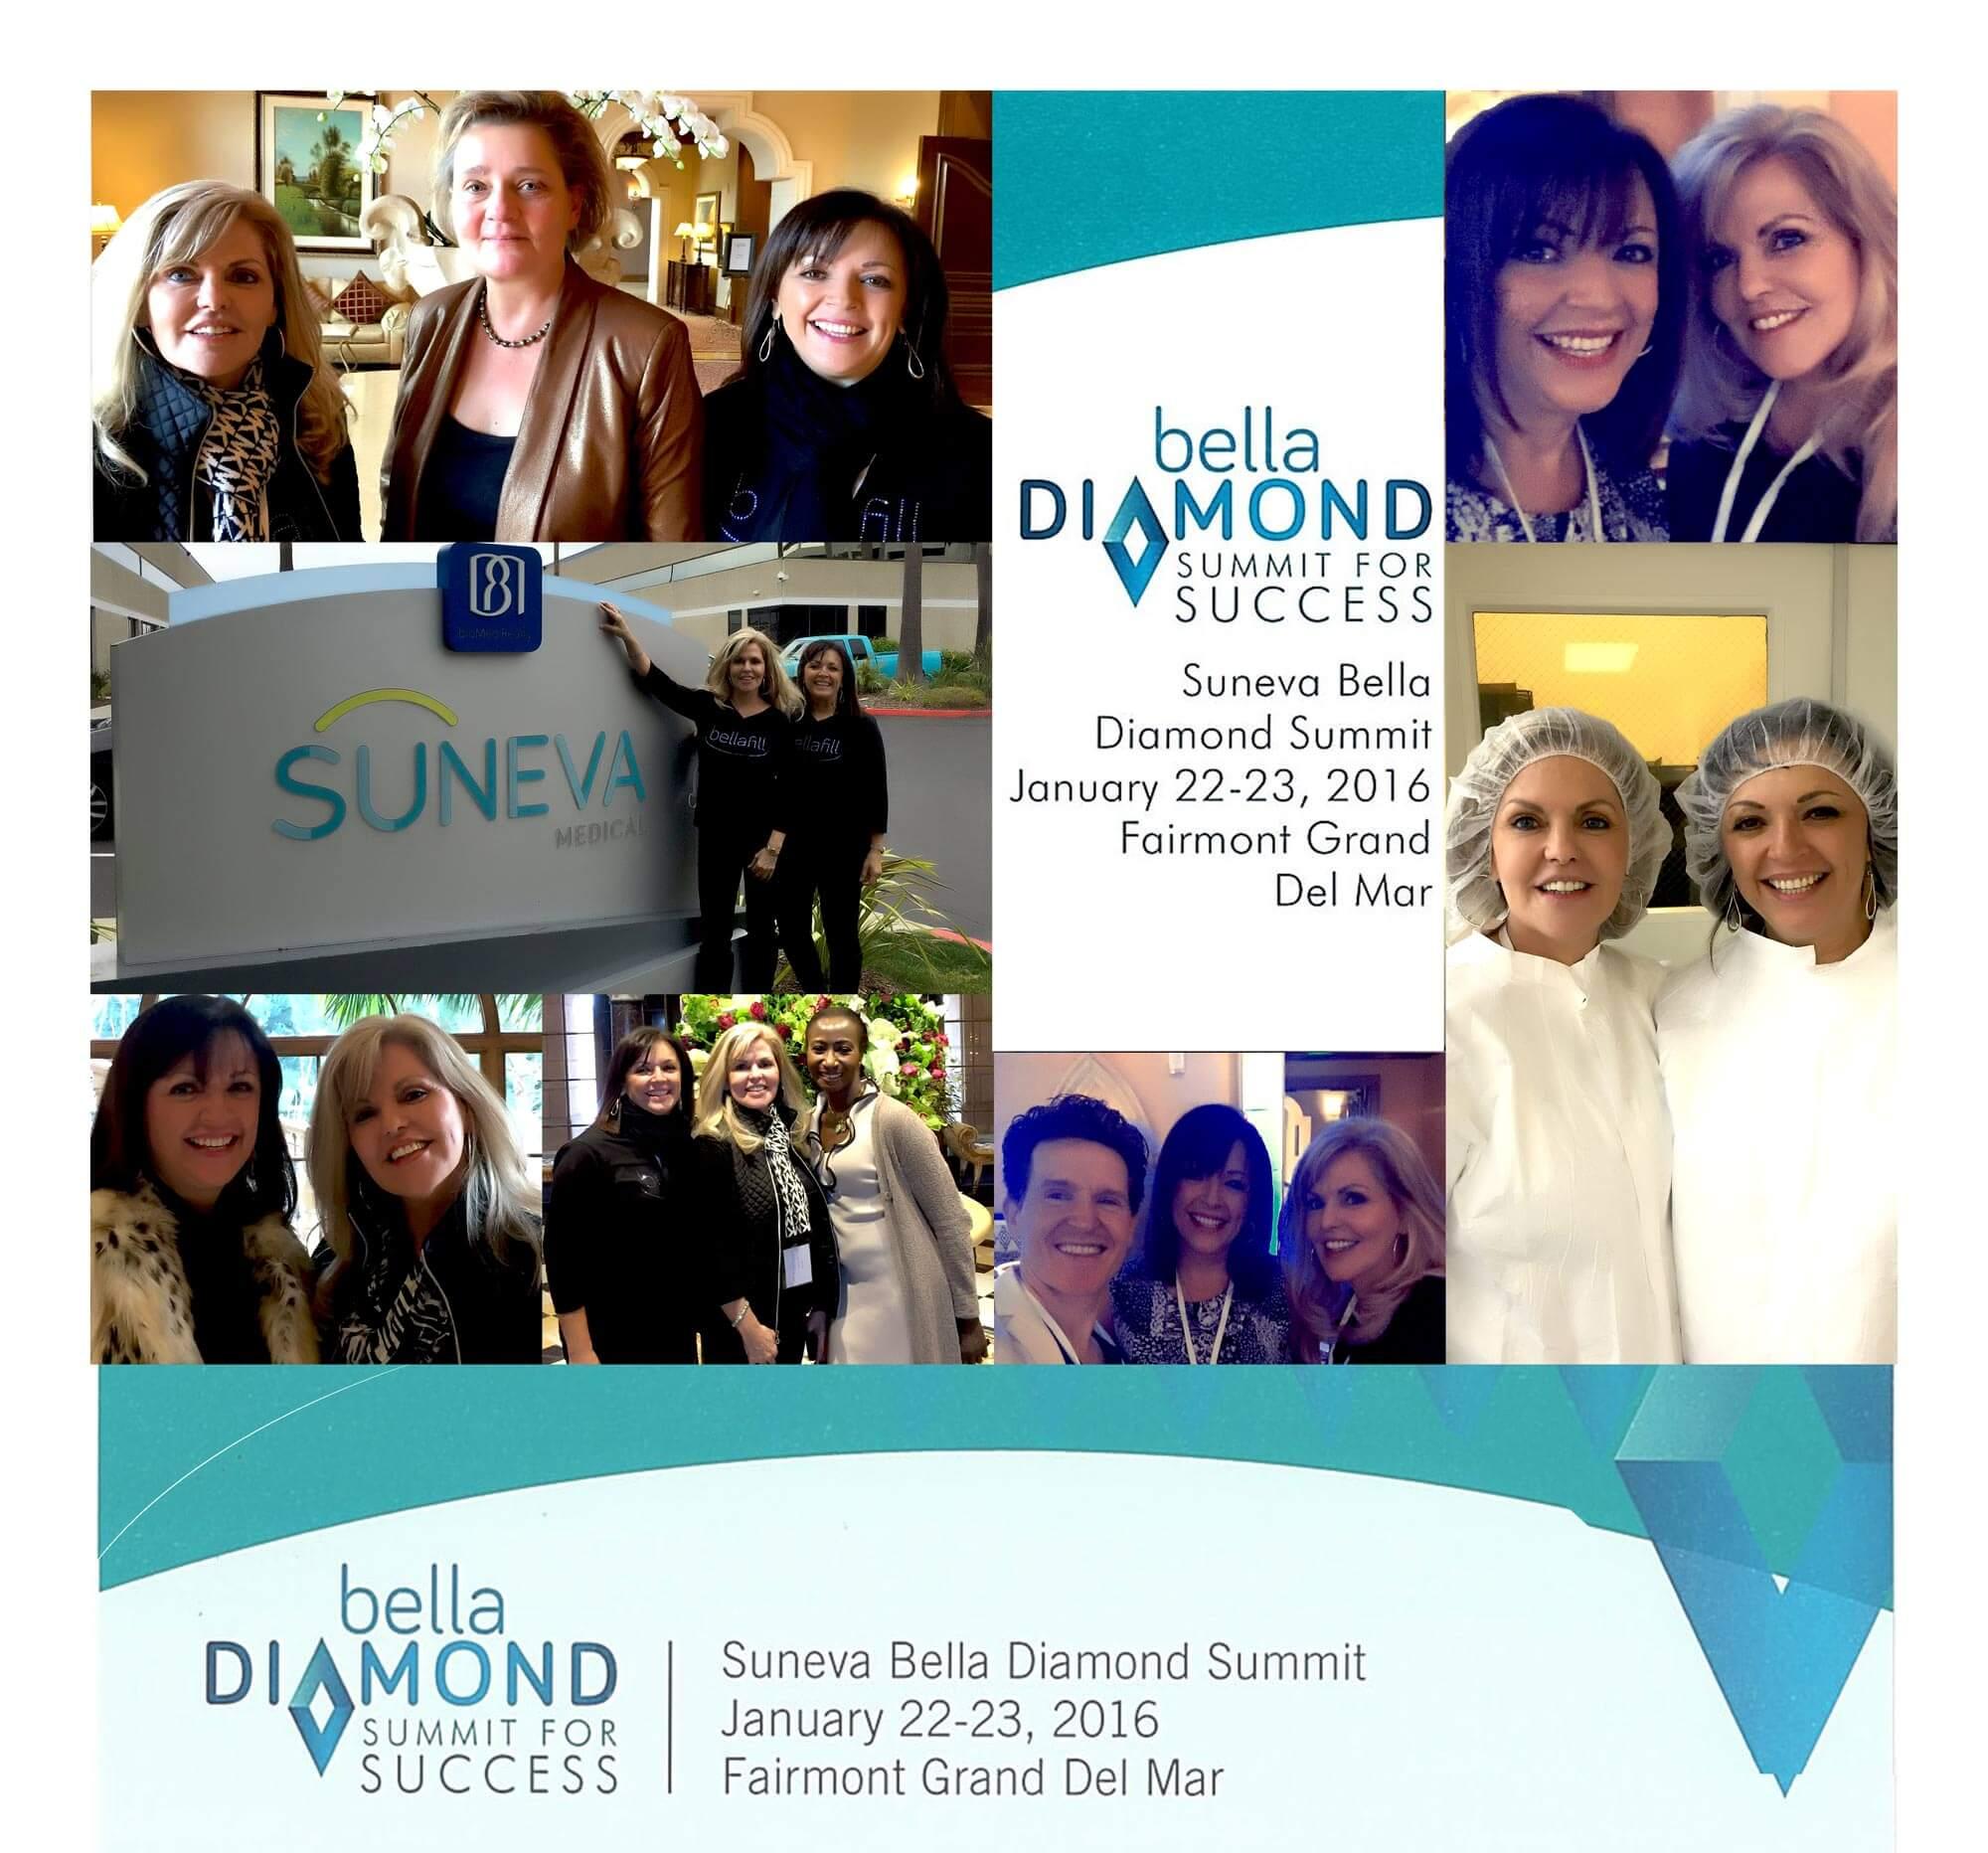 Bella Diamond Summit for Success